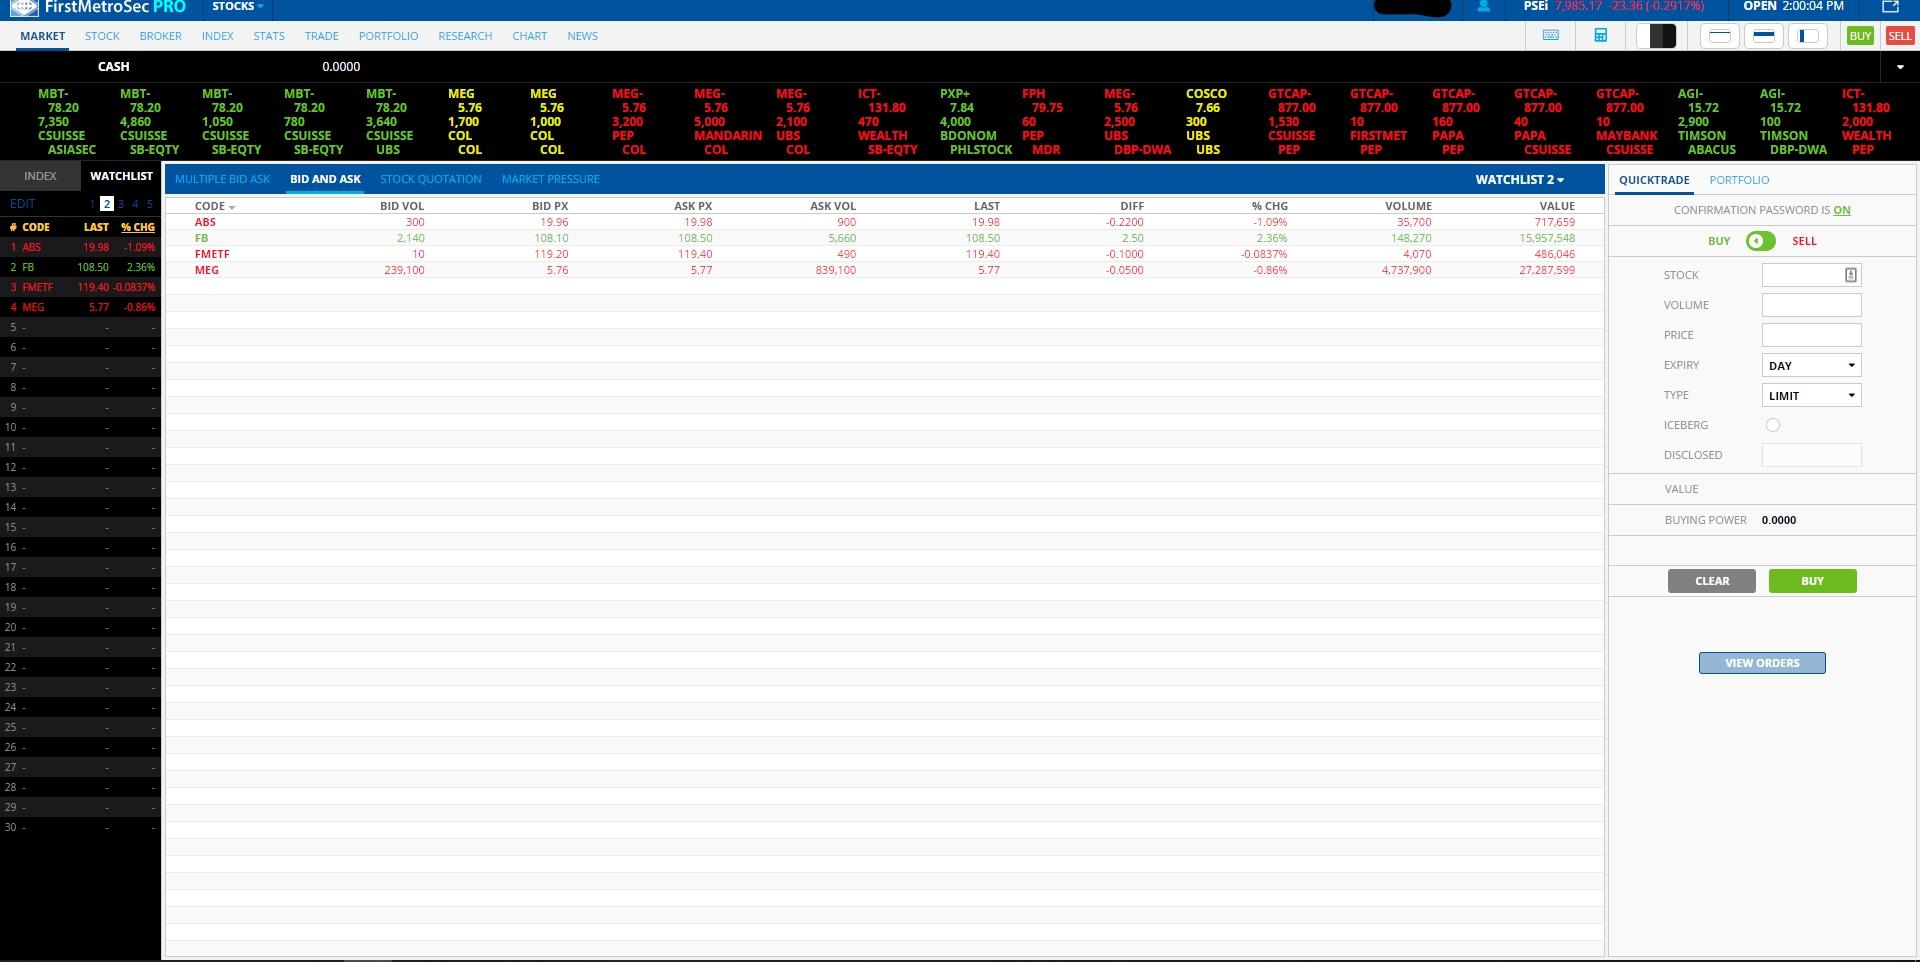 FirstMetroSec Pro Watchlist